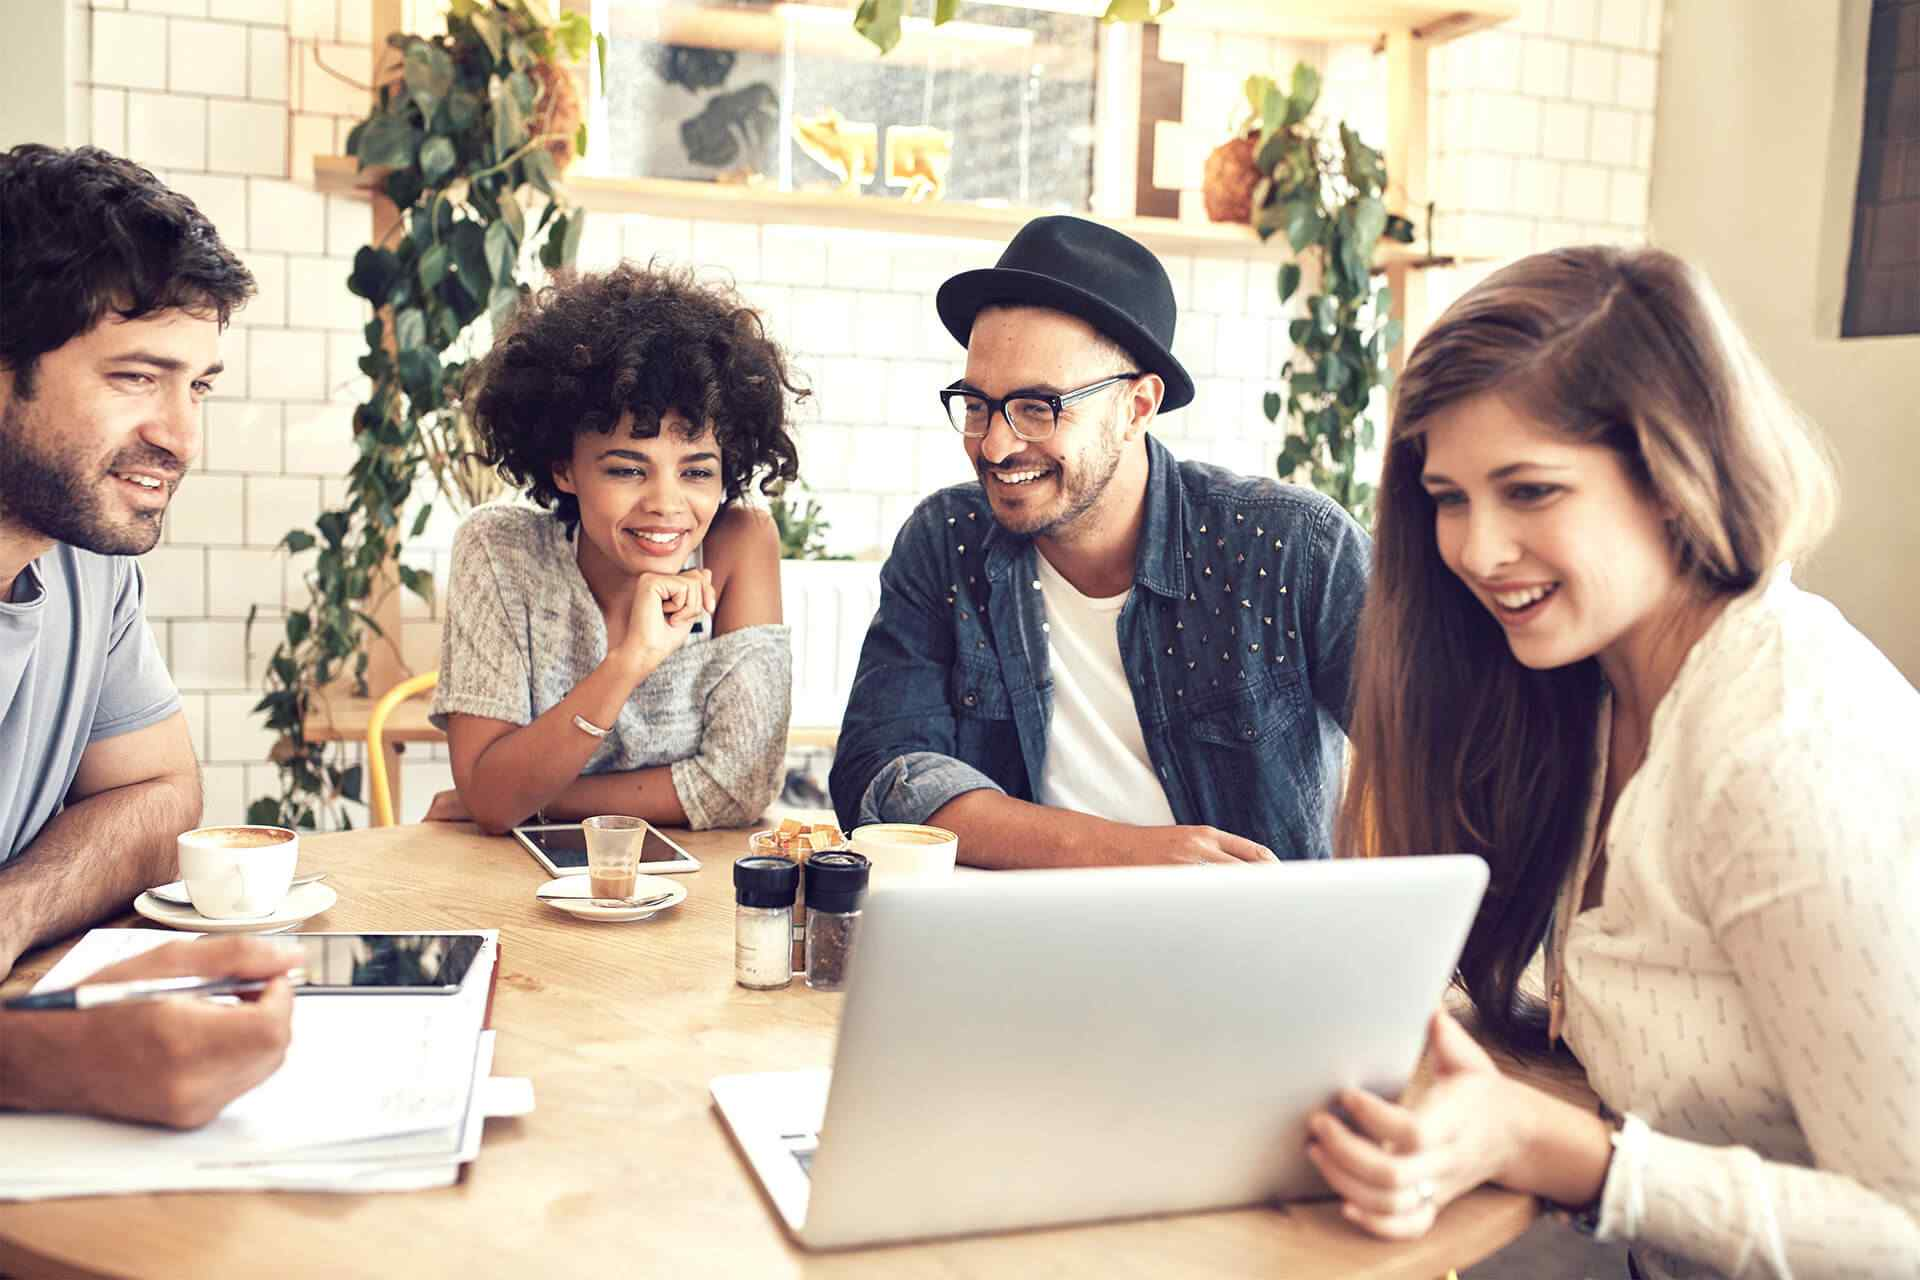 three young millennials smiling at a computer screen; one young millennial smiling at his coworkers' notes